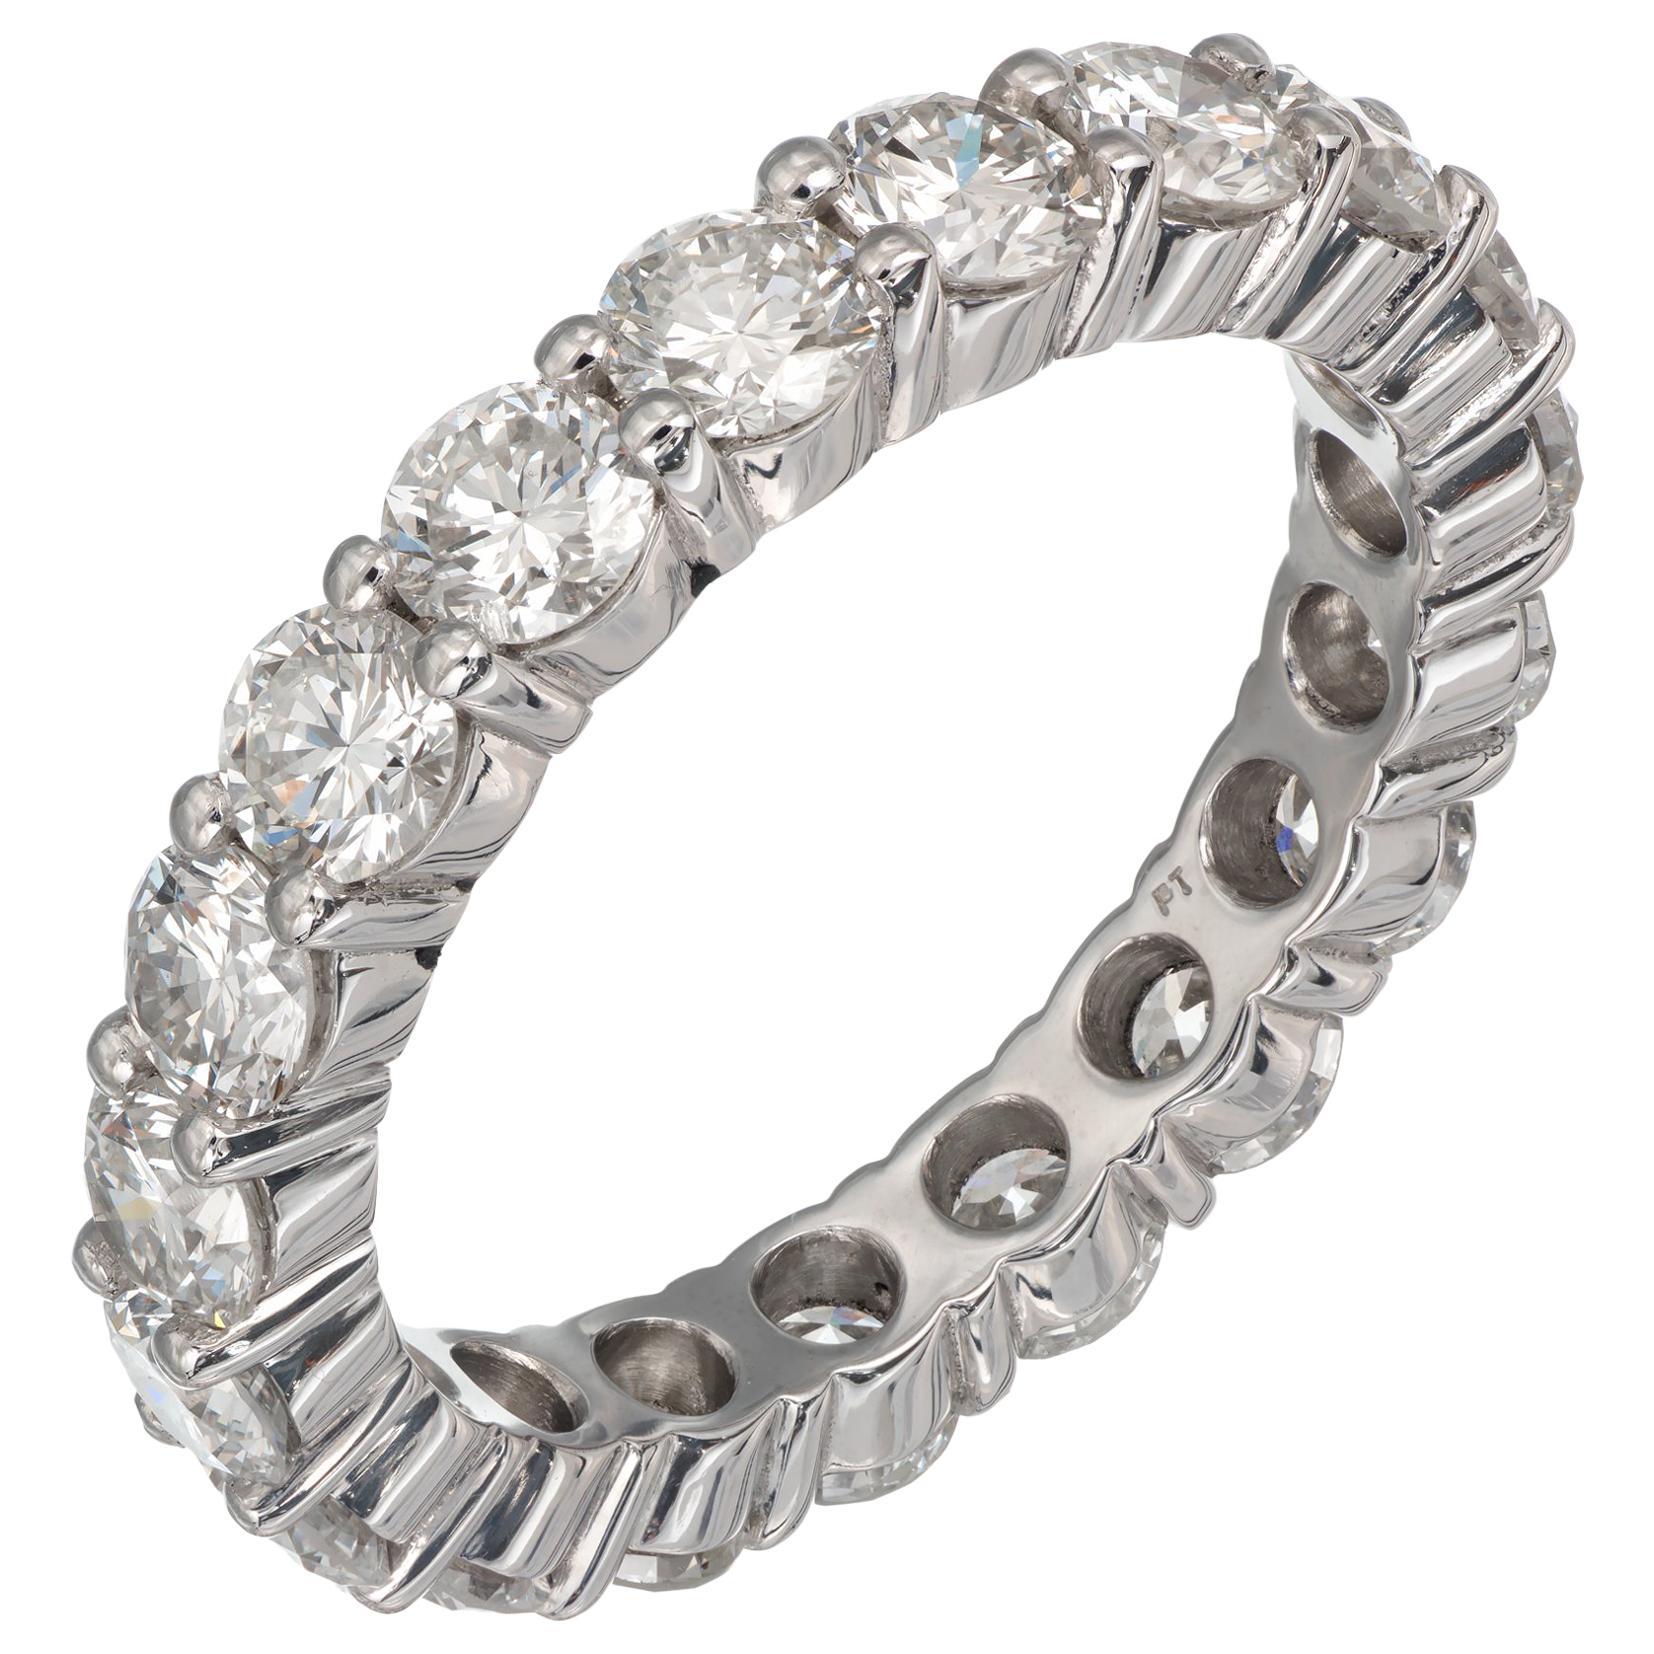 Peter Suchy 2.72 Carat Diamond Platinum Eternity Wedding Band Ring